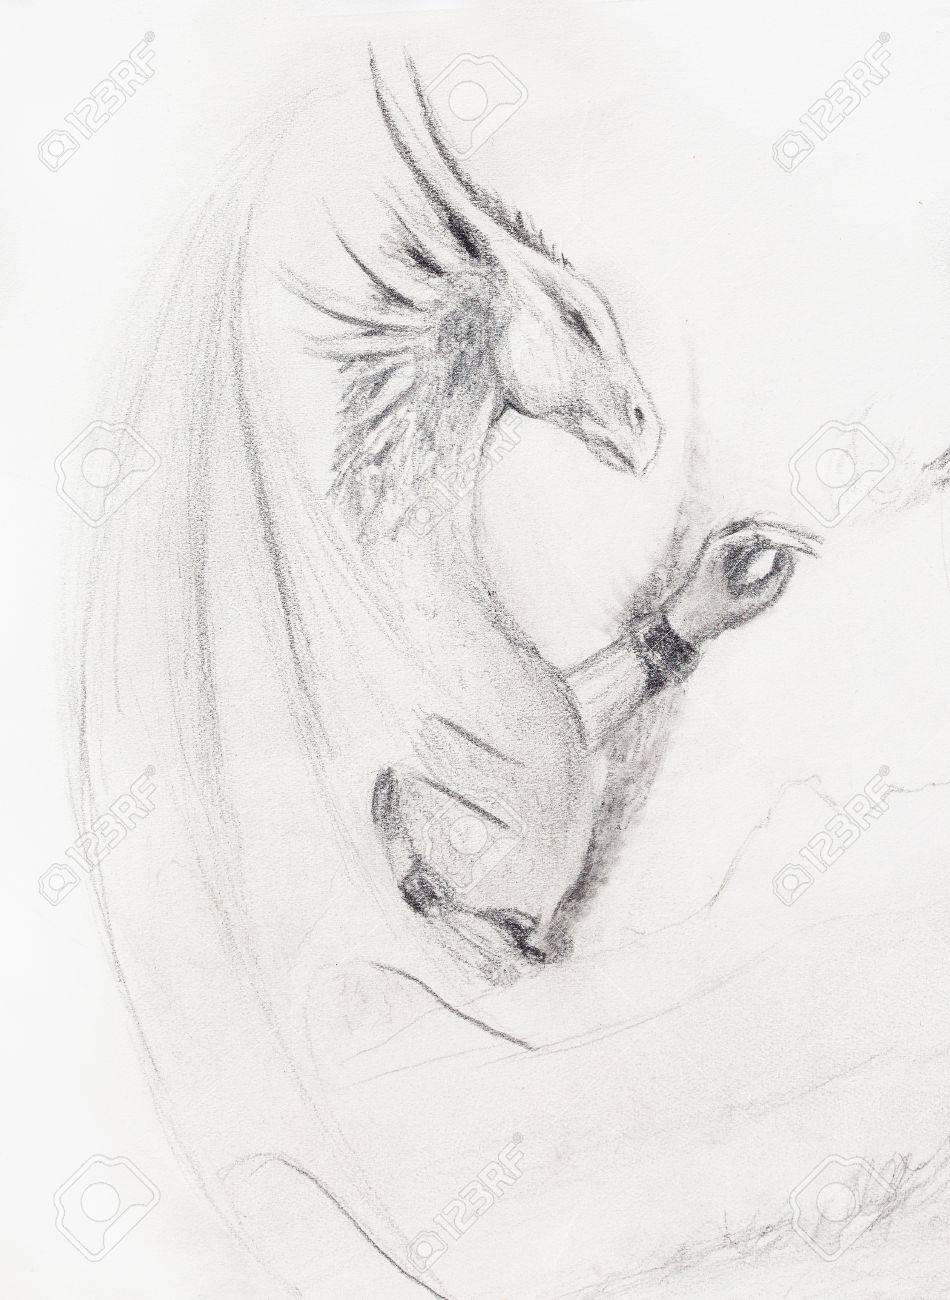 Dragón Dibujo A Lápiz Sobre Fondo De Papel Viejo Fotos Retratos